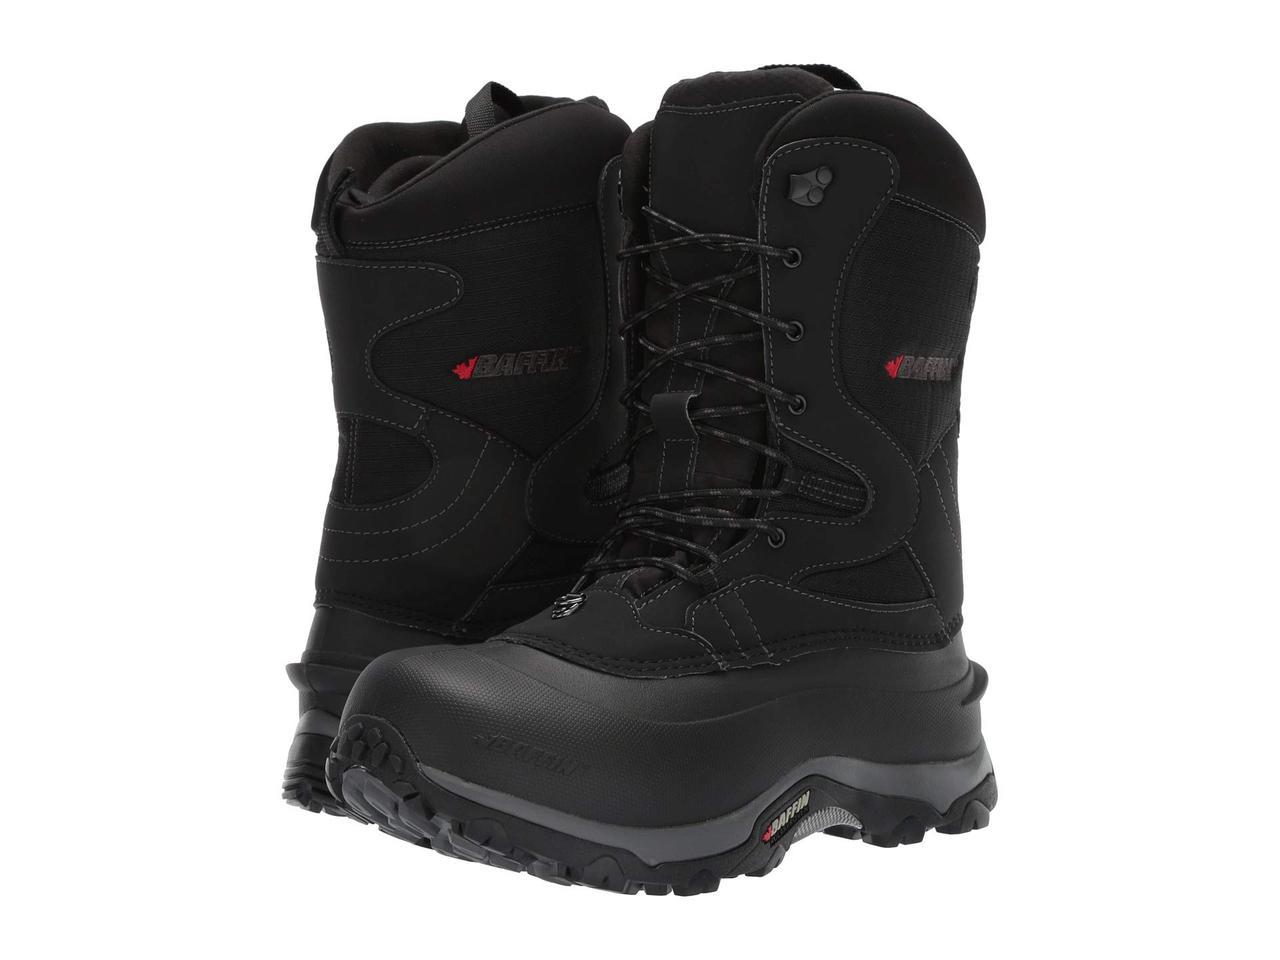 Ботинки/Сапоги (Оригинал) Baffin Summit Black